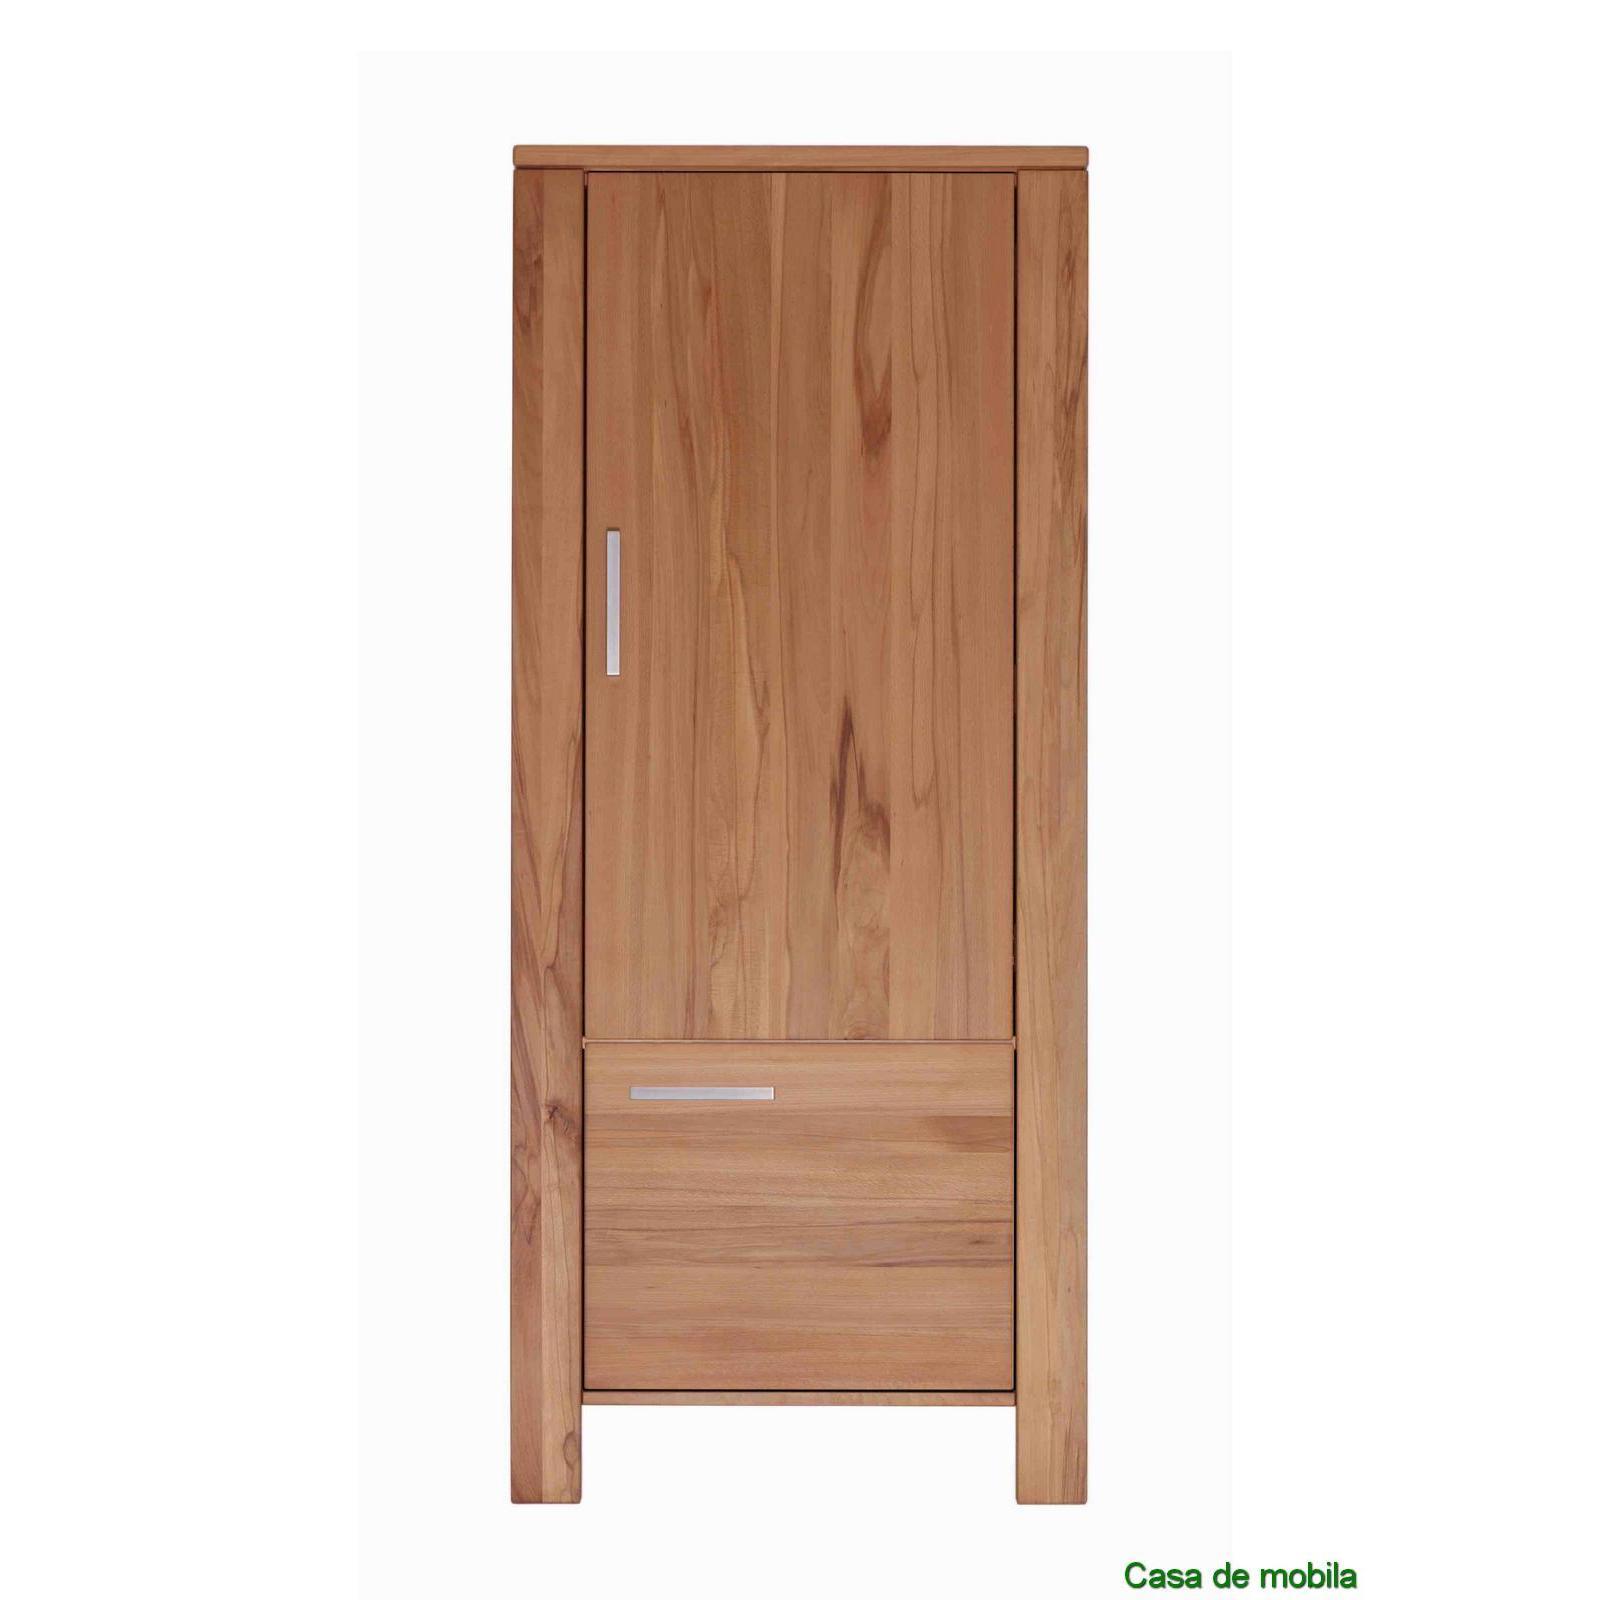 wohnzimmer schrank massivholz 2017 09 05 02 02 16 ezwol. Black Bedroom Furniture Sets. Home Design Ideas